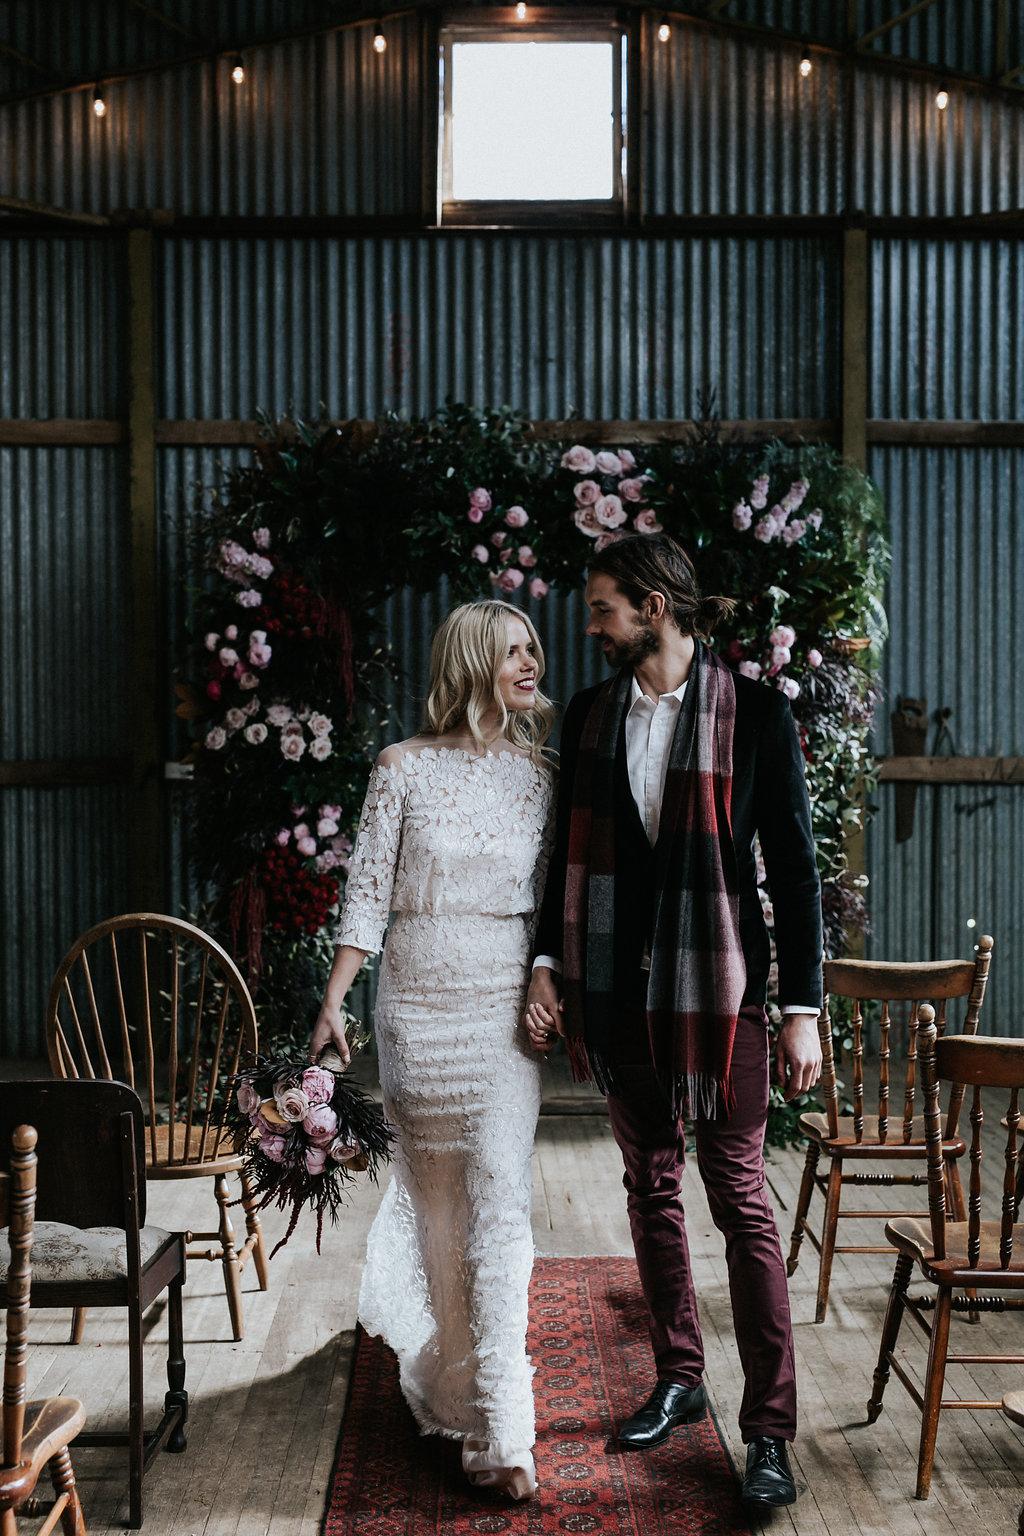 waldara-winter-wedding-sheep-shed